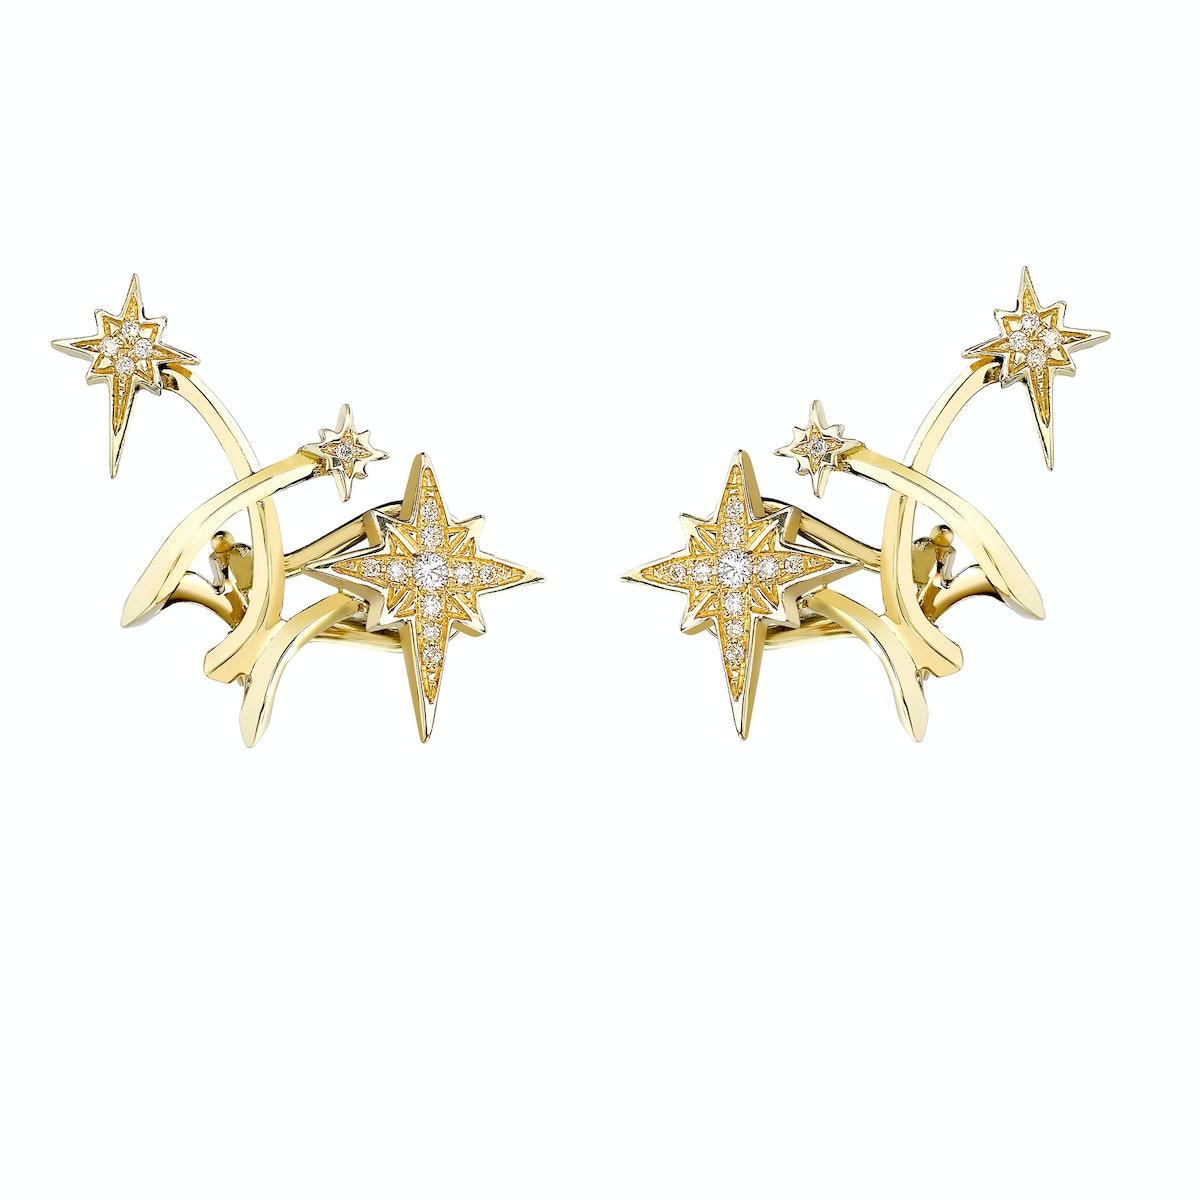 Venyx 18k gold and diamond Lady Australis ear cuffs